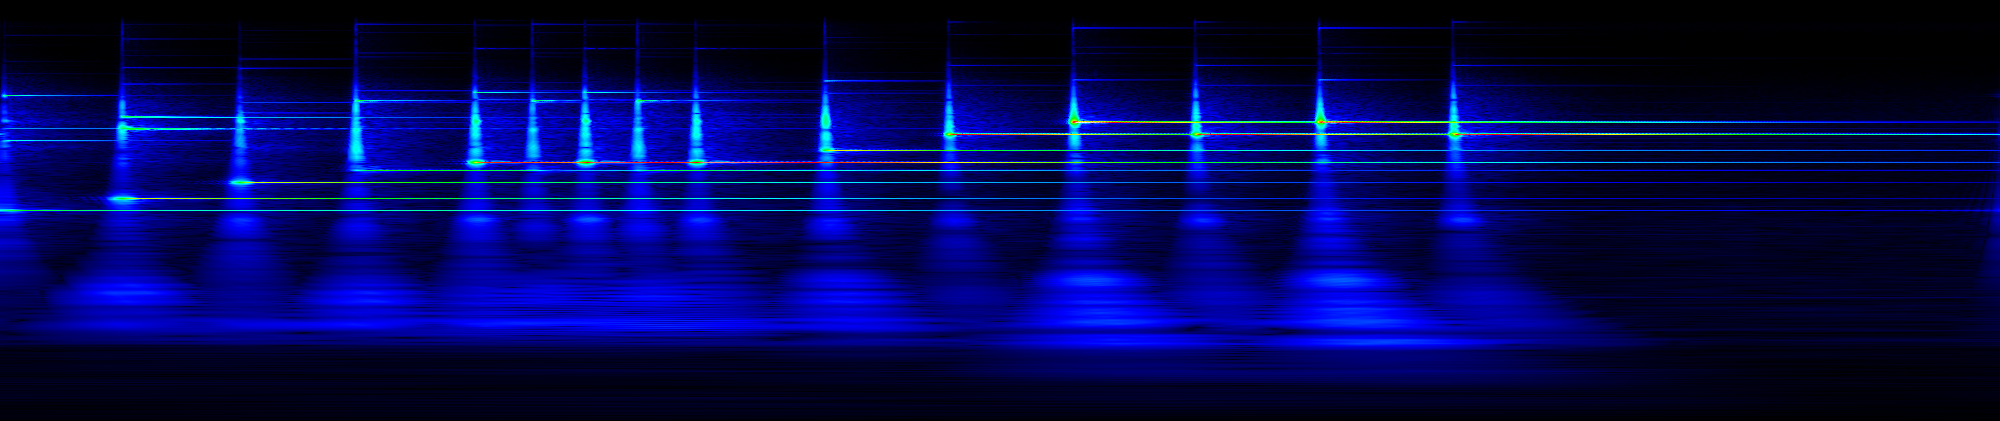 Glockenspiel spectrogram, sone scaled